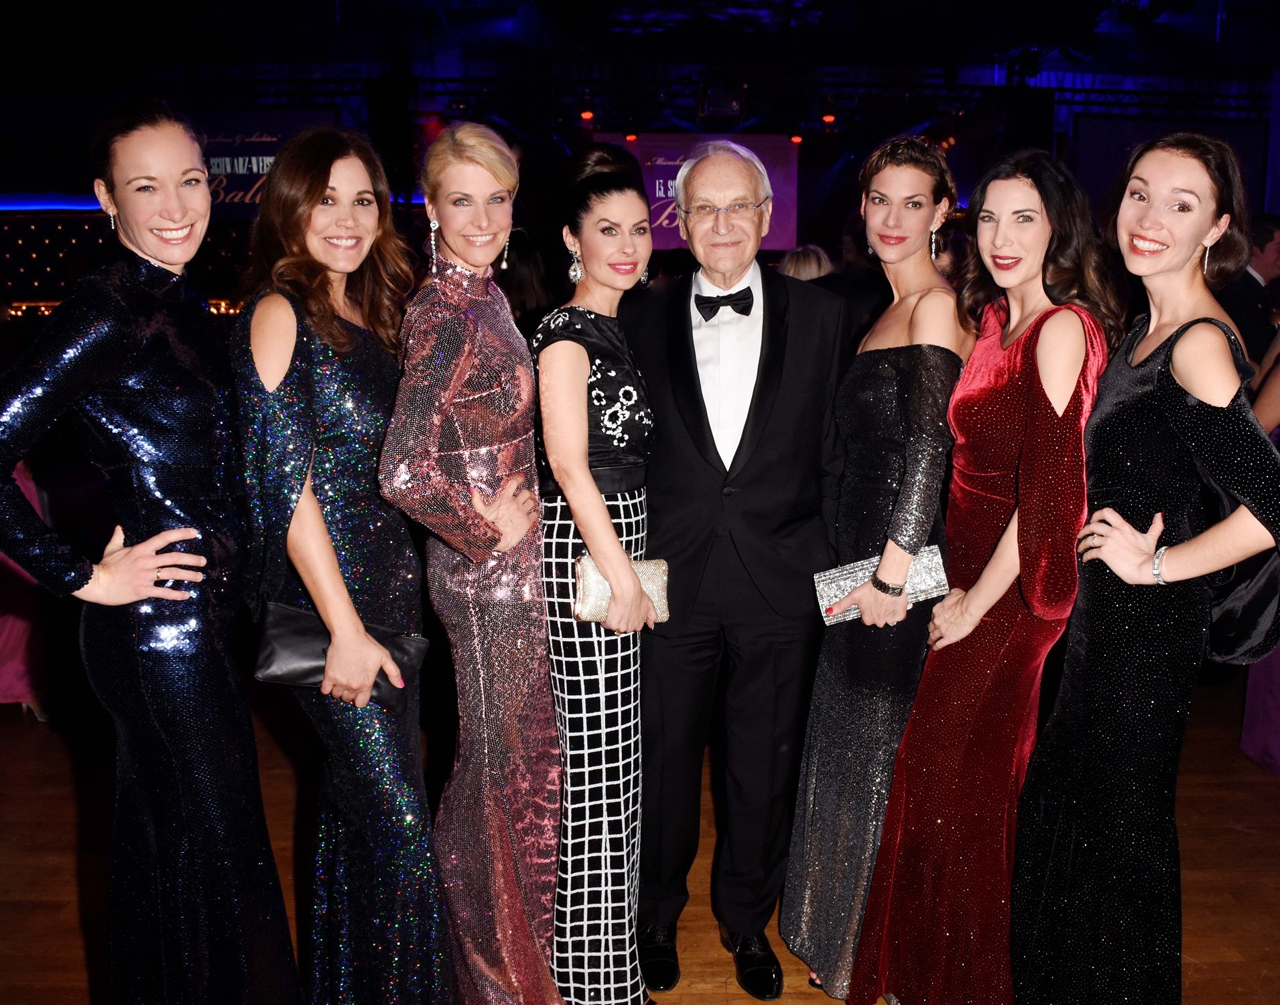 CSU-Ball v.l.n.r.: Christine Theiss, Karen Webb, Natascha Grün, Edmund Stoiber, Sarah Kronsbein, Alexandra Polzin, Anja Eisenreich (c) Petra Schönberger